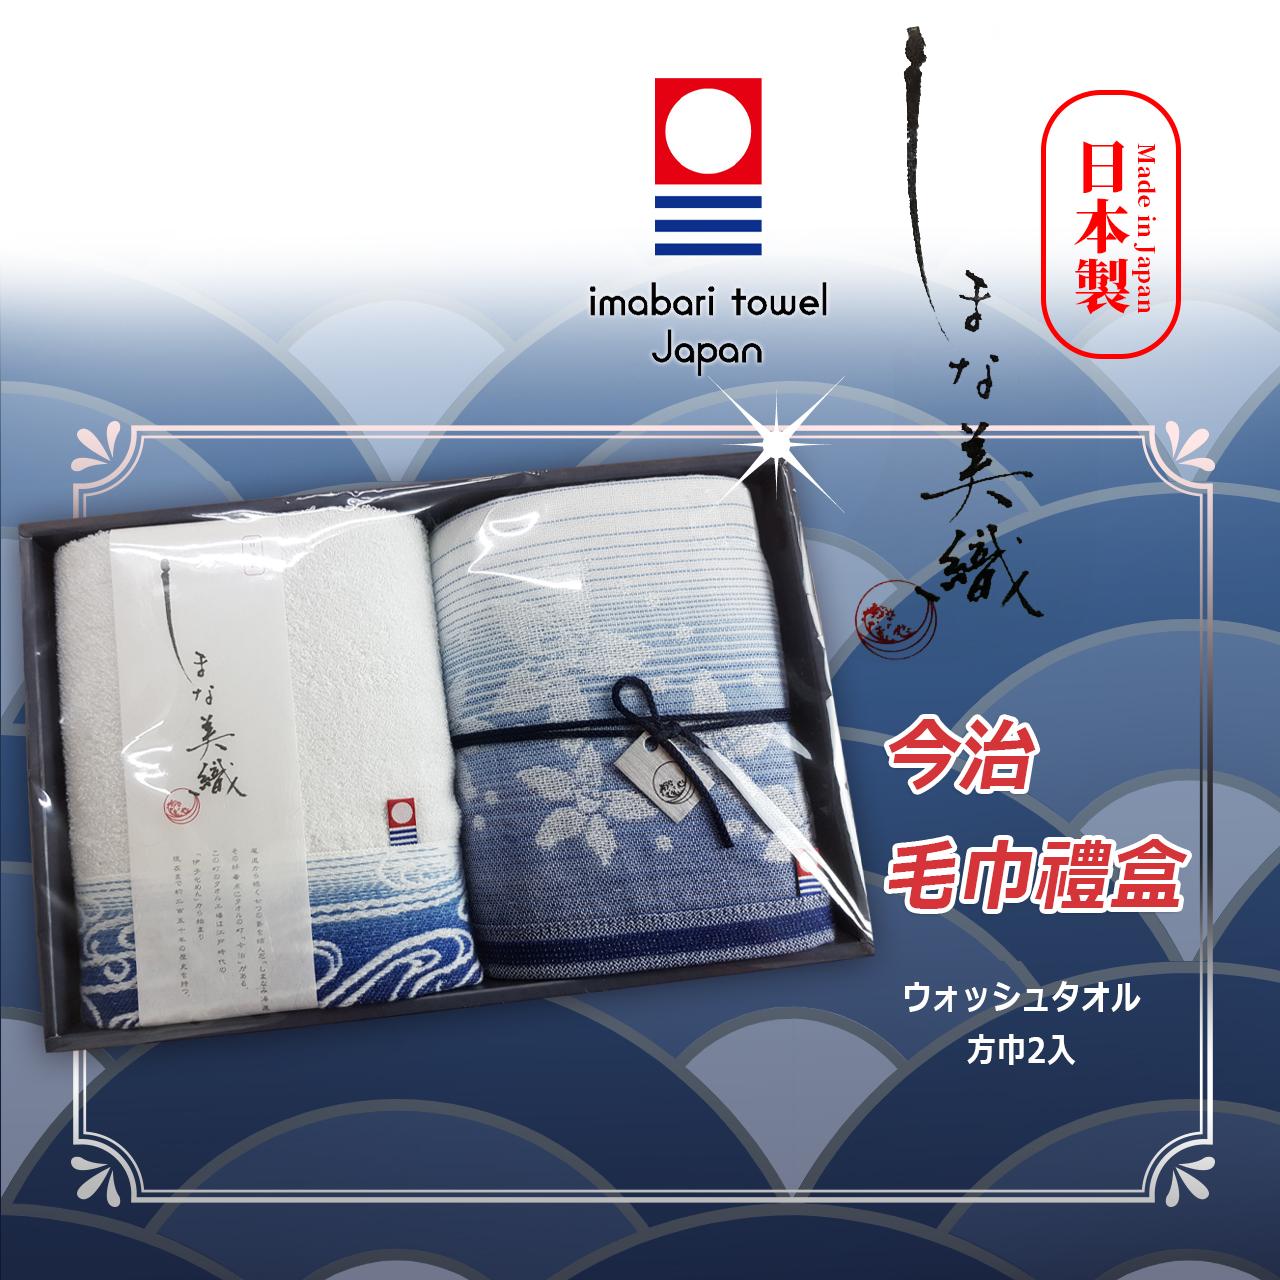 《HOYA-Life日本生活館》日本製 今治 純棉 吸水 毛巾 方巾 產地直送  藍色 はな美織 禮盒